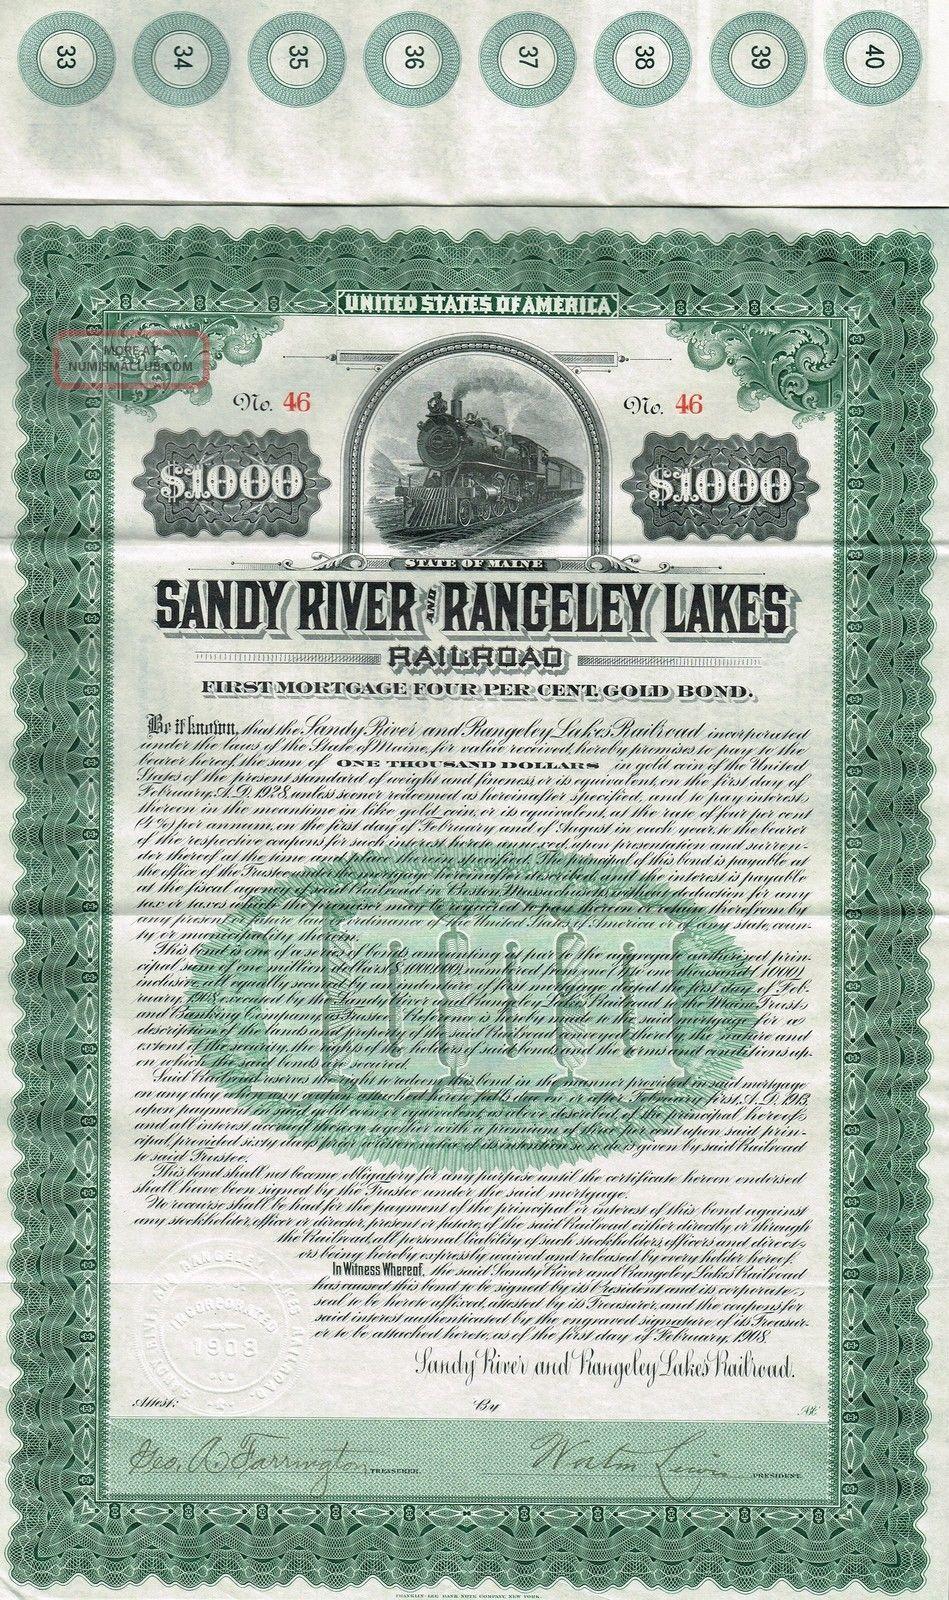 Usa Sandy River & Rangeley Lakes Railroad Bond Stock Certificate 1908 World photo